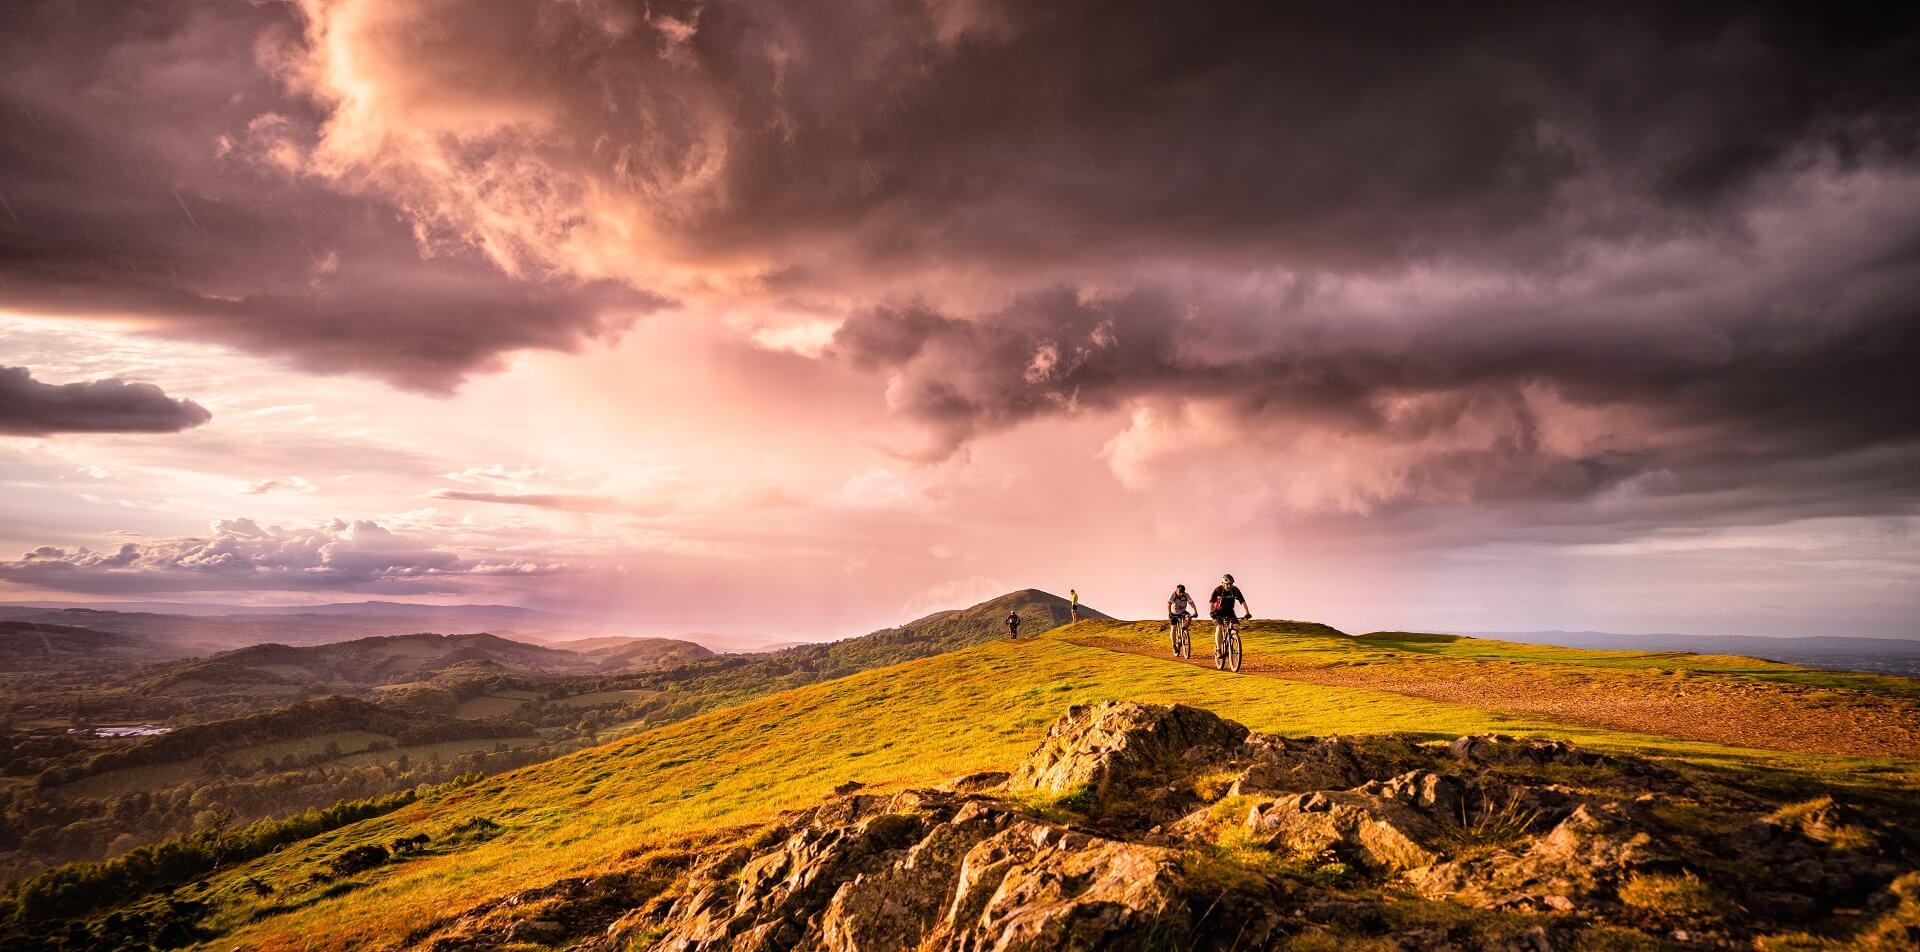 Riding the storm Copyright Jan Sedlacek